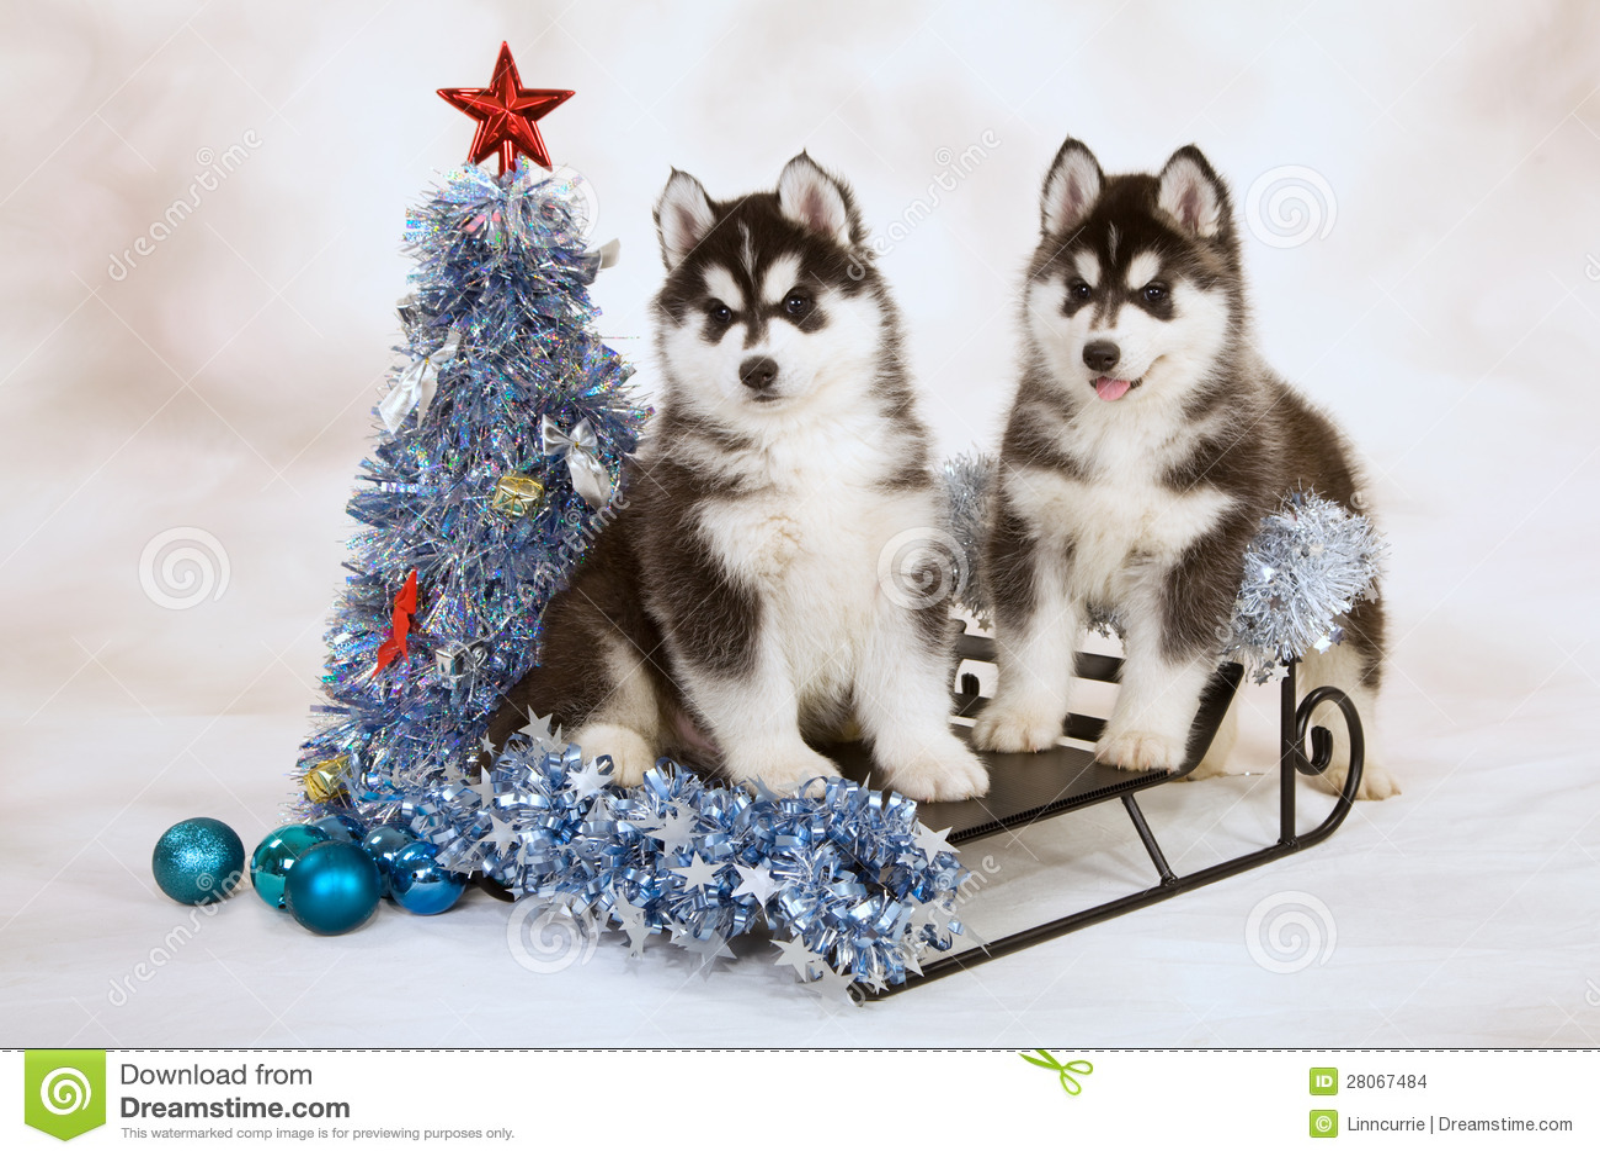 Husky Christmas Cards.Siberian Husky Puppies Stock Photo Image Of Present 28067484